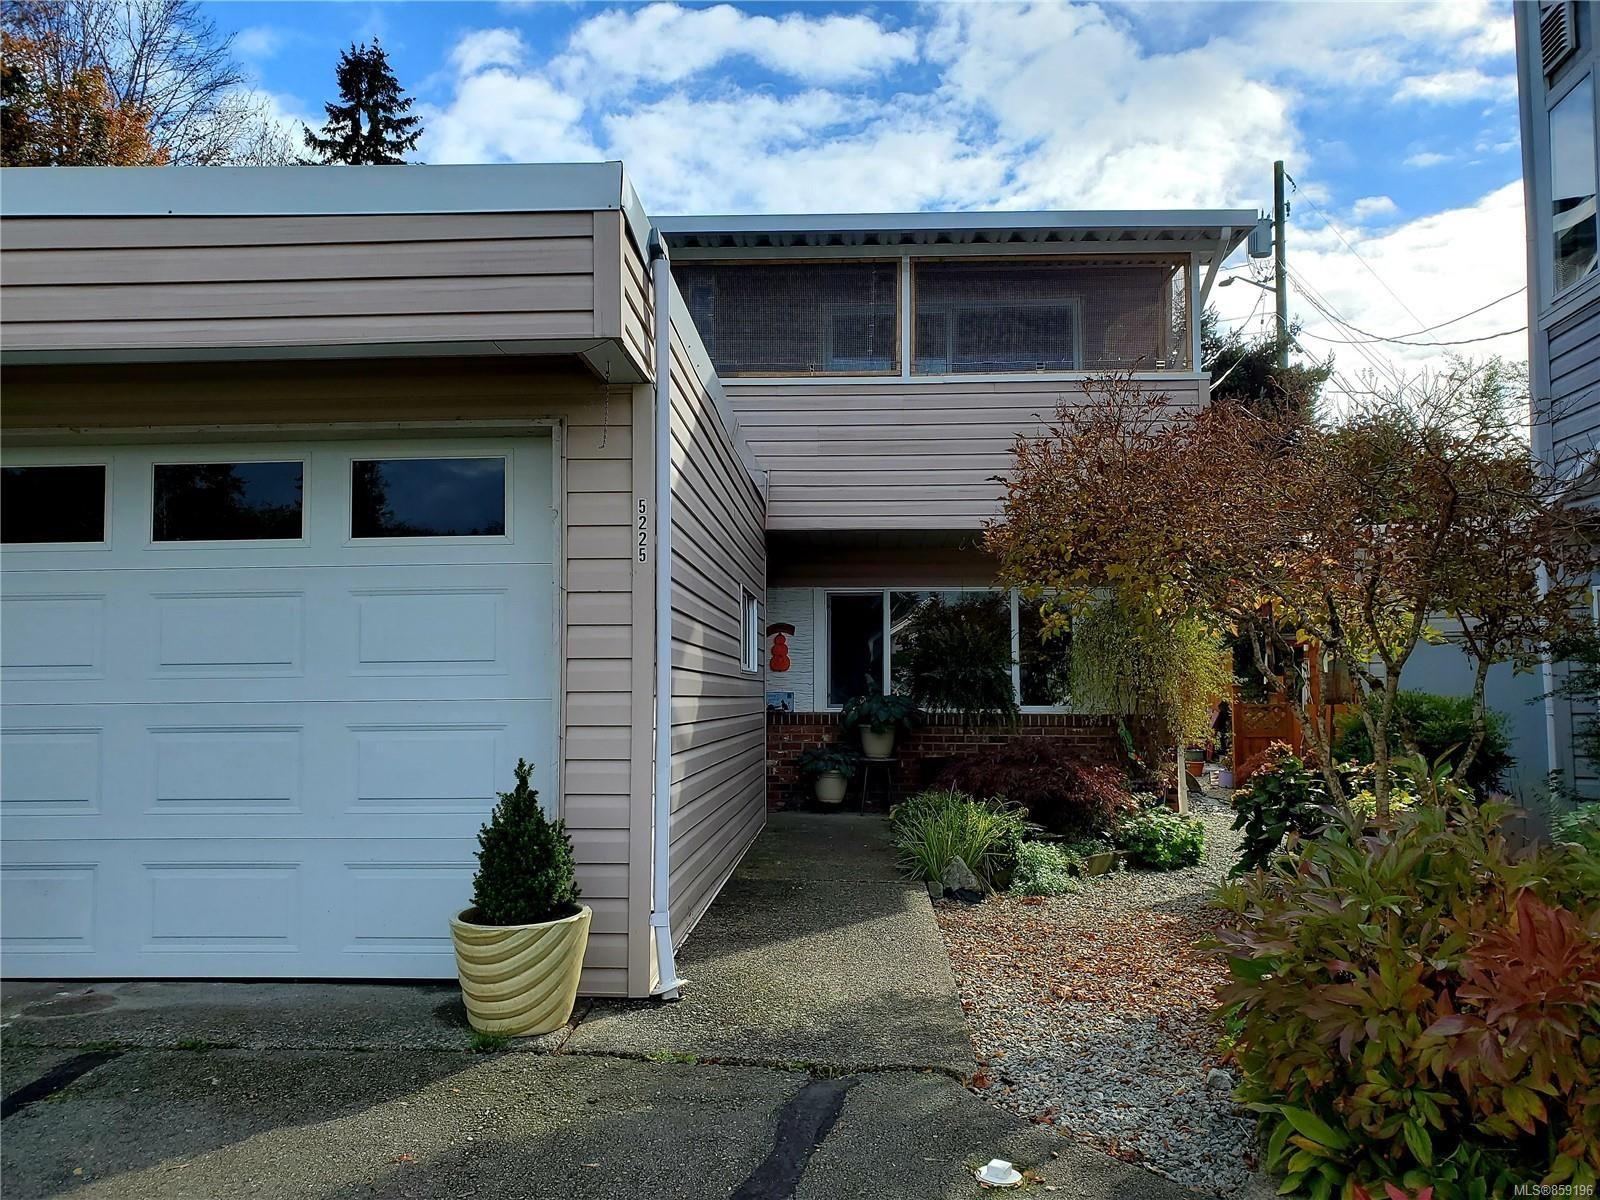 Main Photo: 5225 Gertrude St in : PA Port Alberni Row/Townhouse for sale (Port Alberni)  : MLS®# 859196